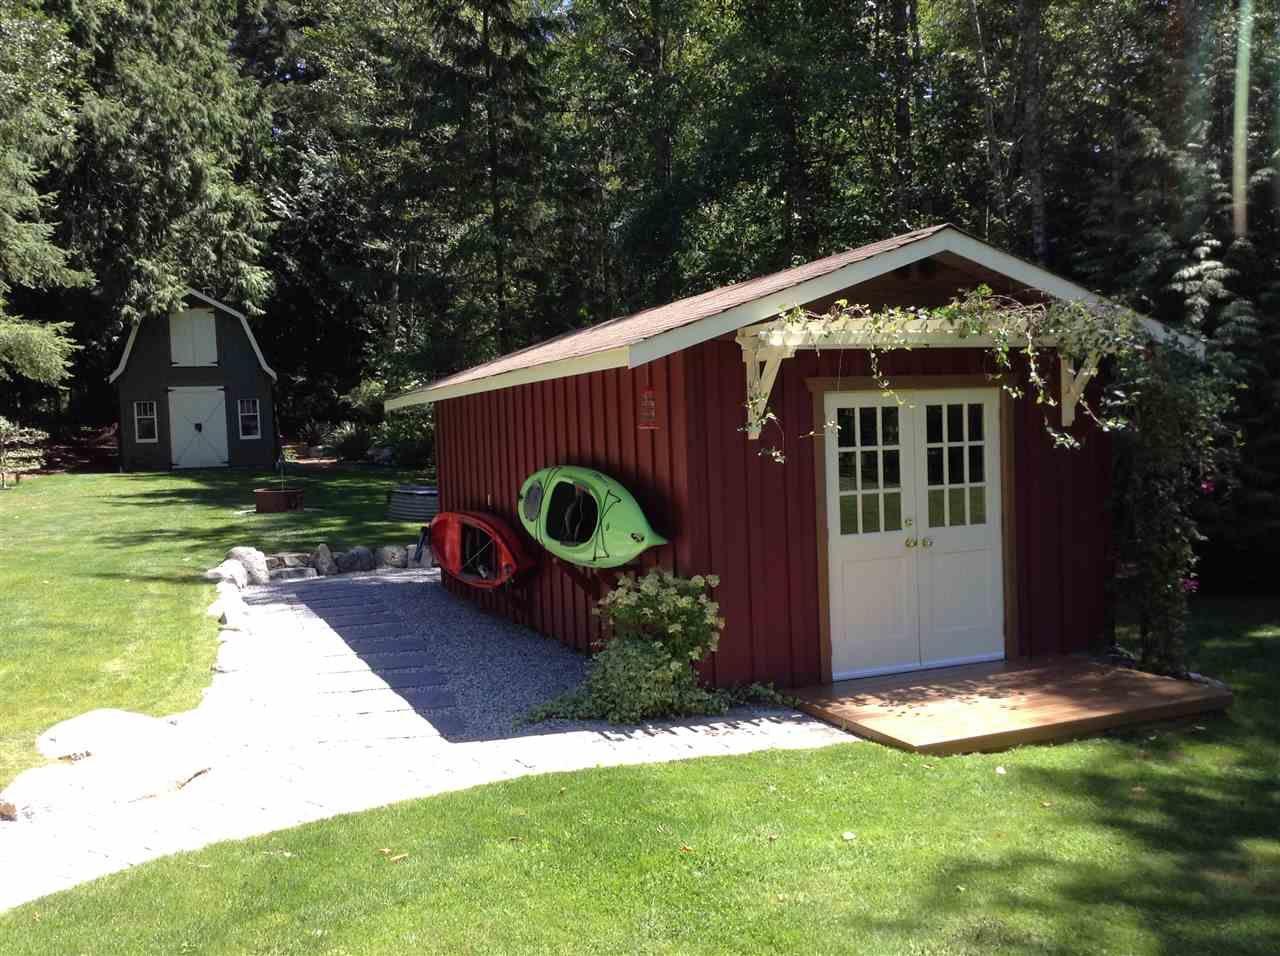 Photo 6: Photos: 5760 MASON Road in Sechelt: Sechelt District House for sale (Sunshine Coast)  : MLS®# R2090042